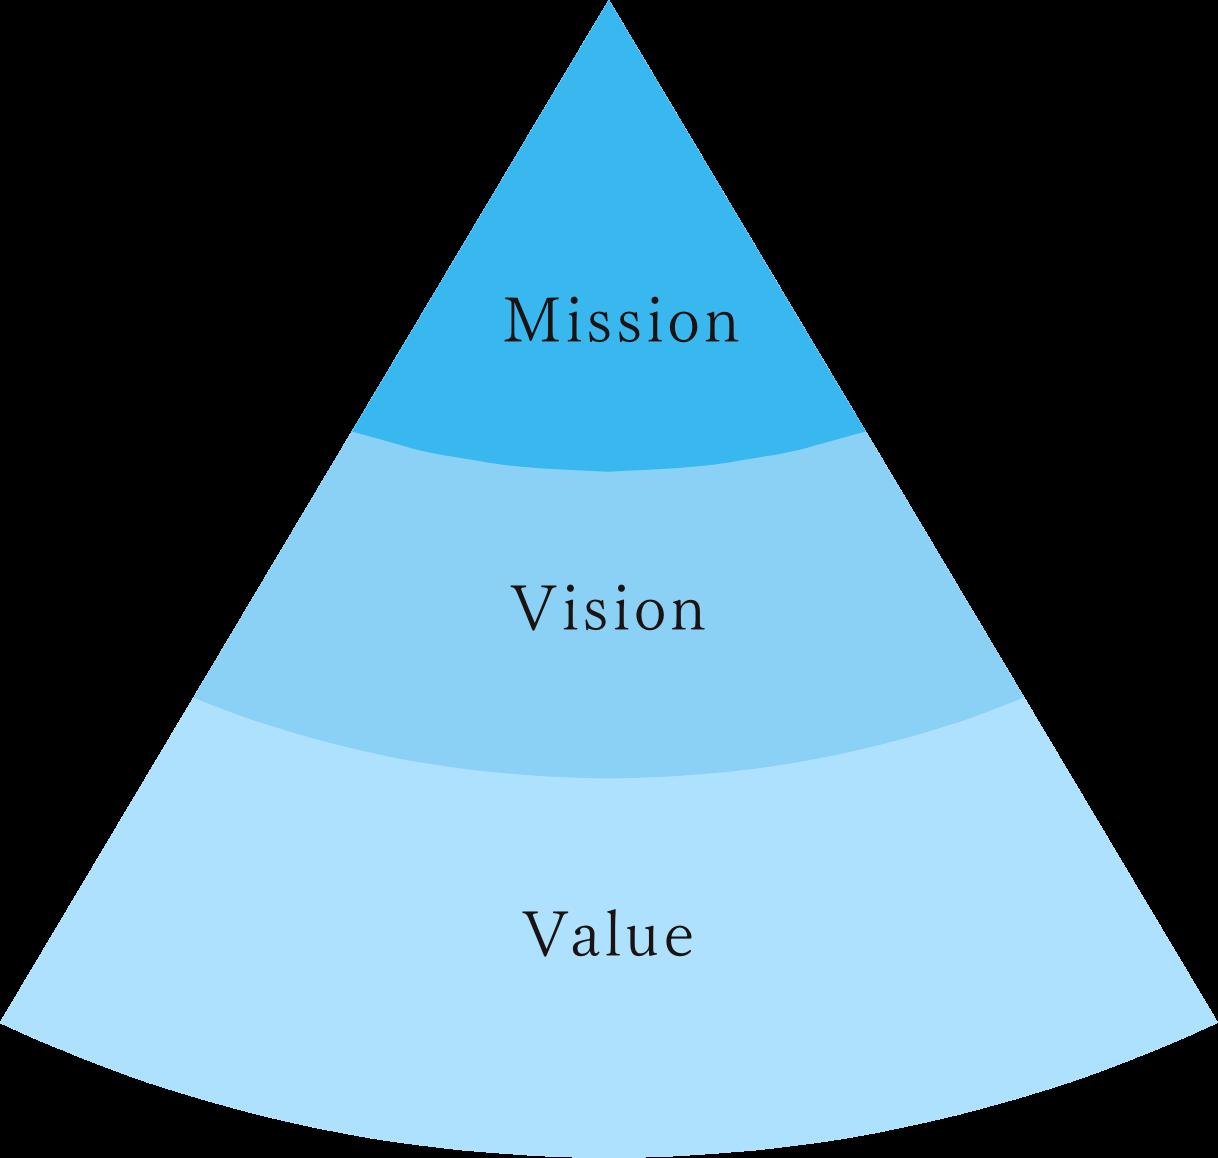 Mission / Vision / Value